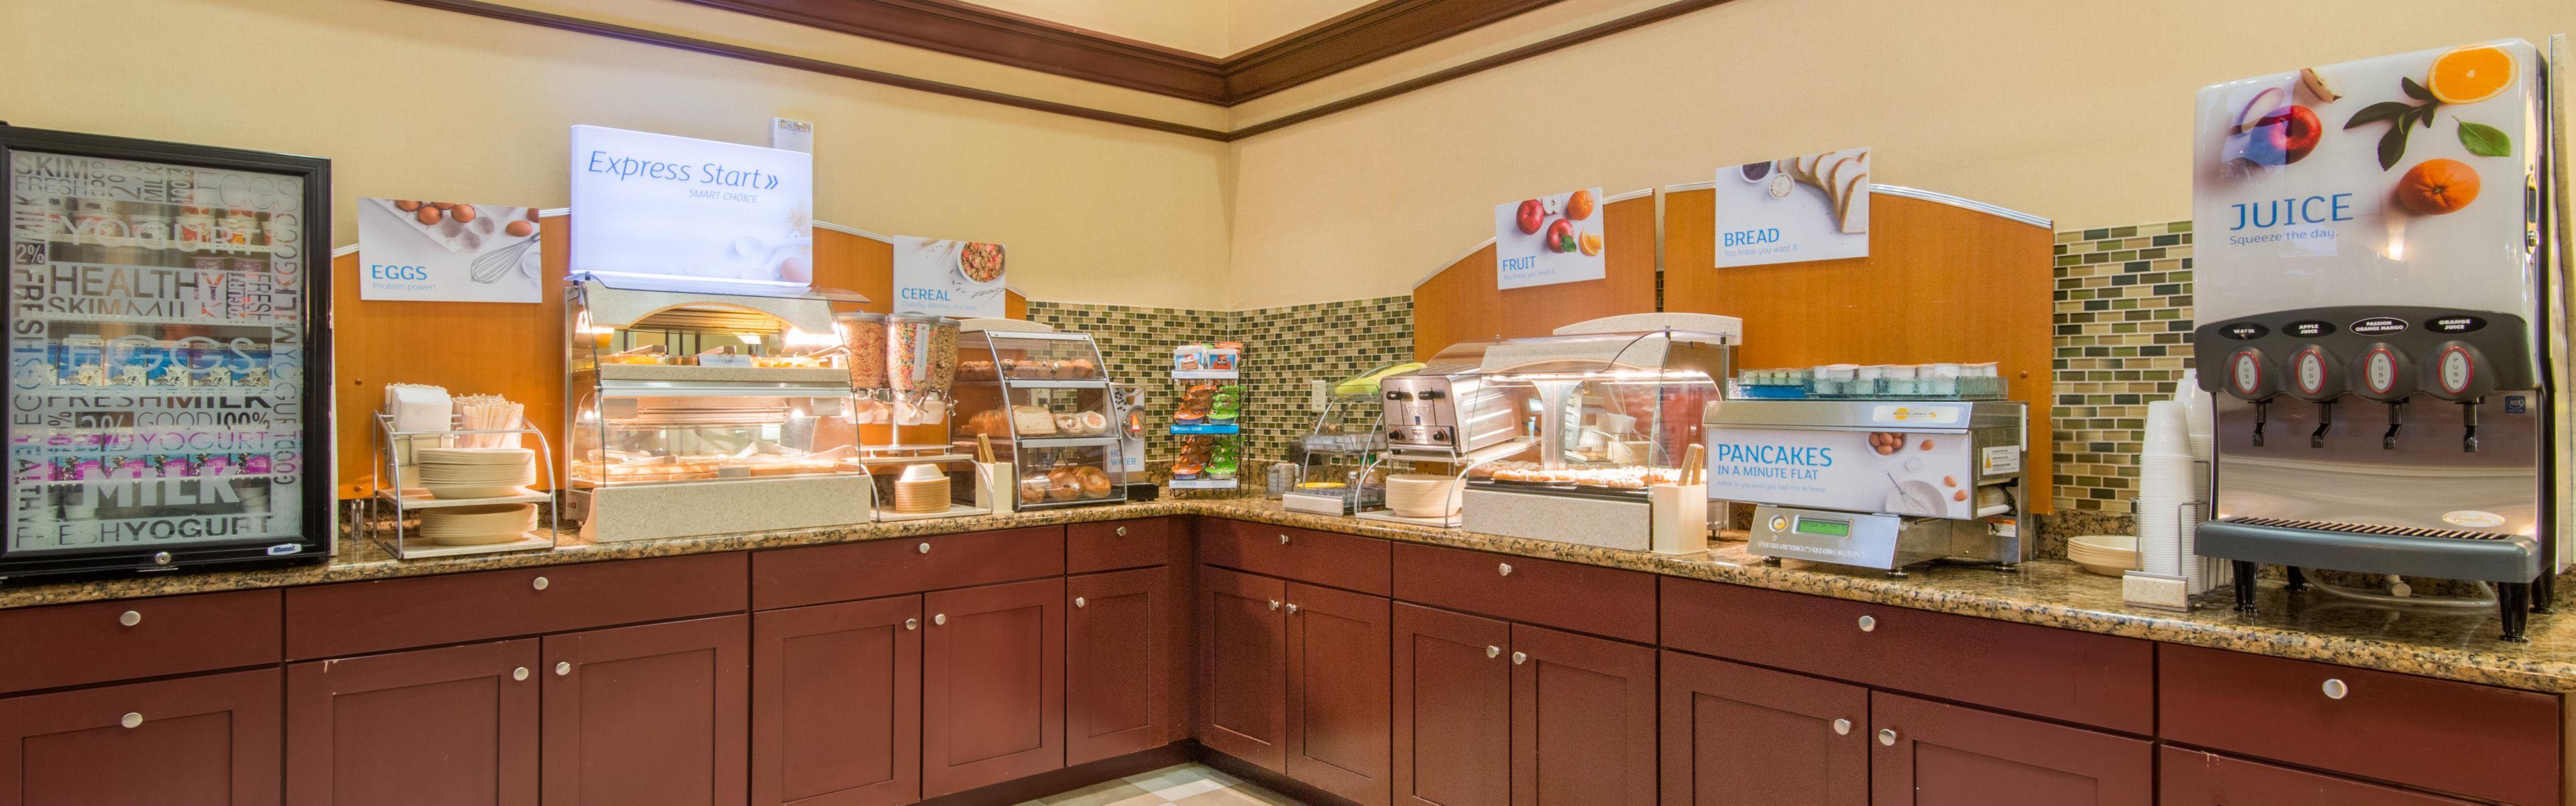 Holiday Inn Express & Suites Phoenix - Glendale Sports Dist image 3